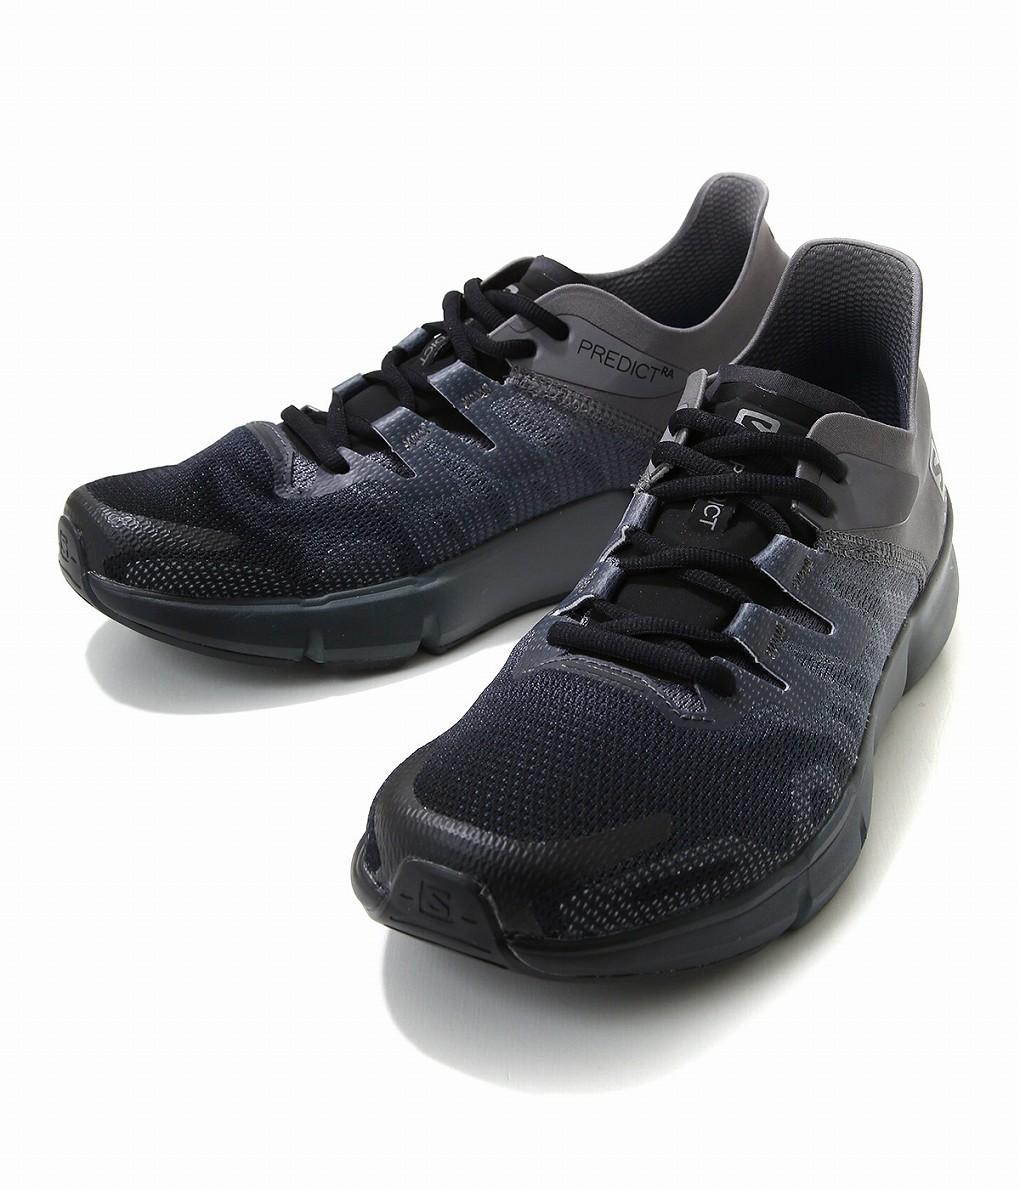 SALOMON / サロモン : PREDICT BLACK/QUIET SHADE/EBONY : プレディクト ブラック スニーカー 靴 シューズ : L40687400 【AST】【REA】